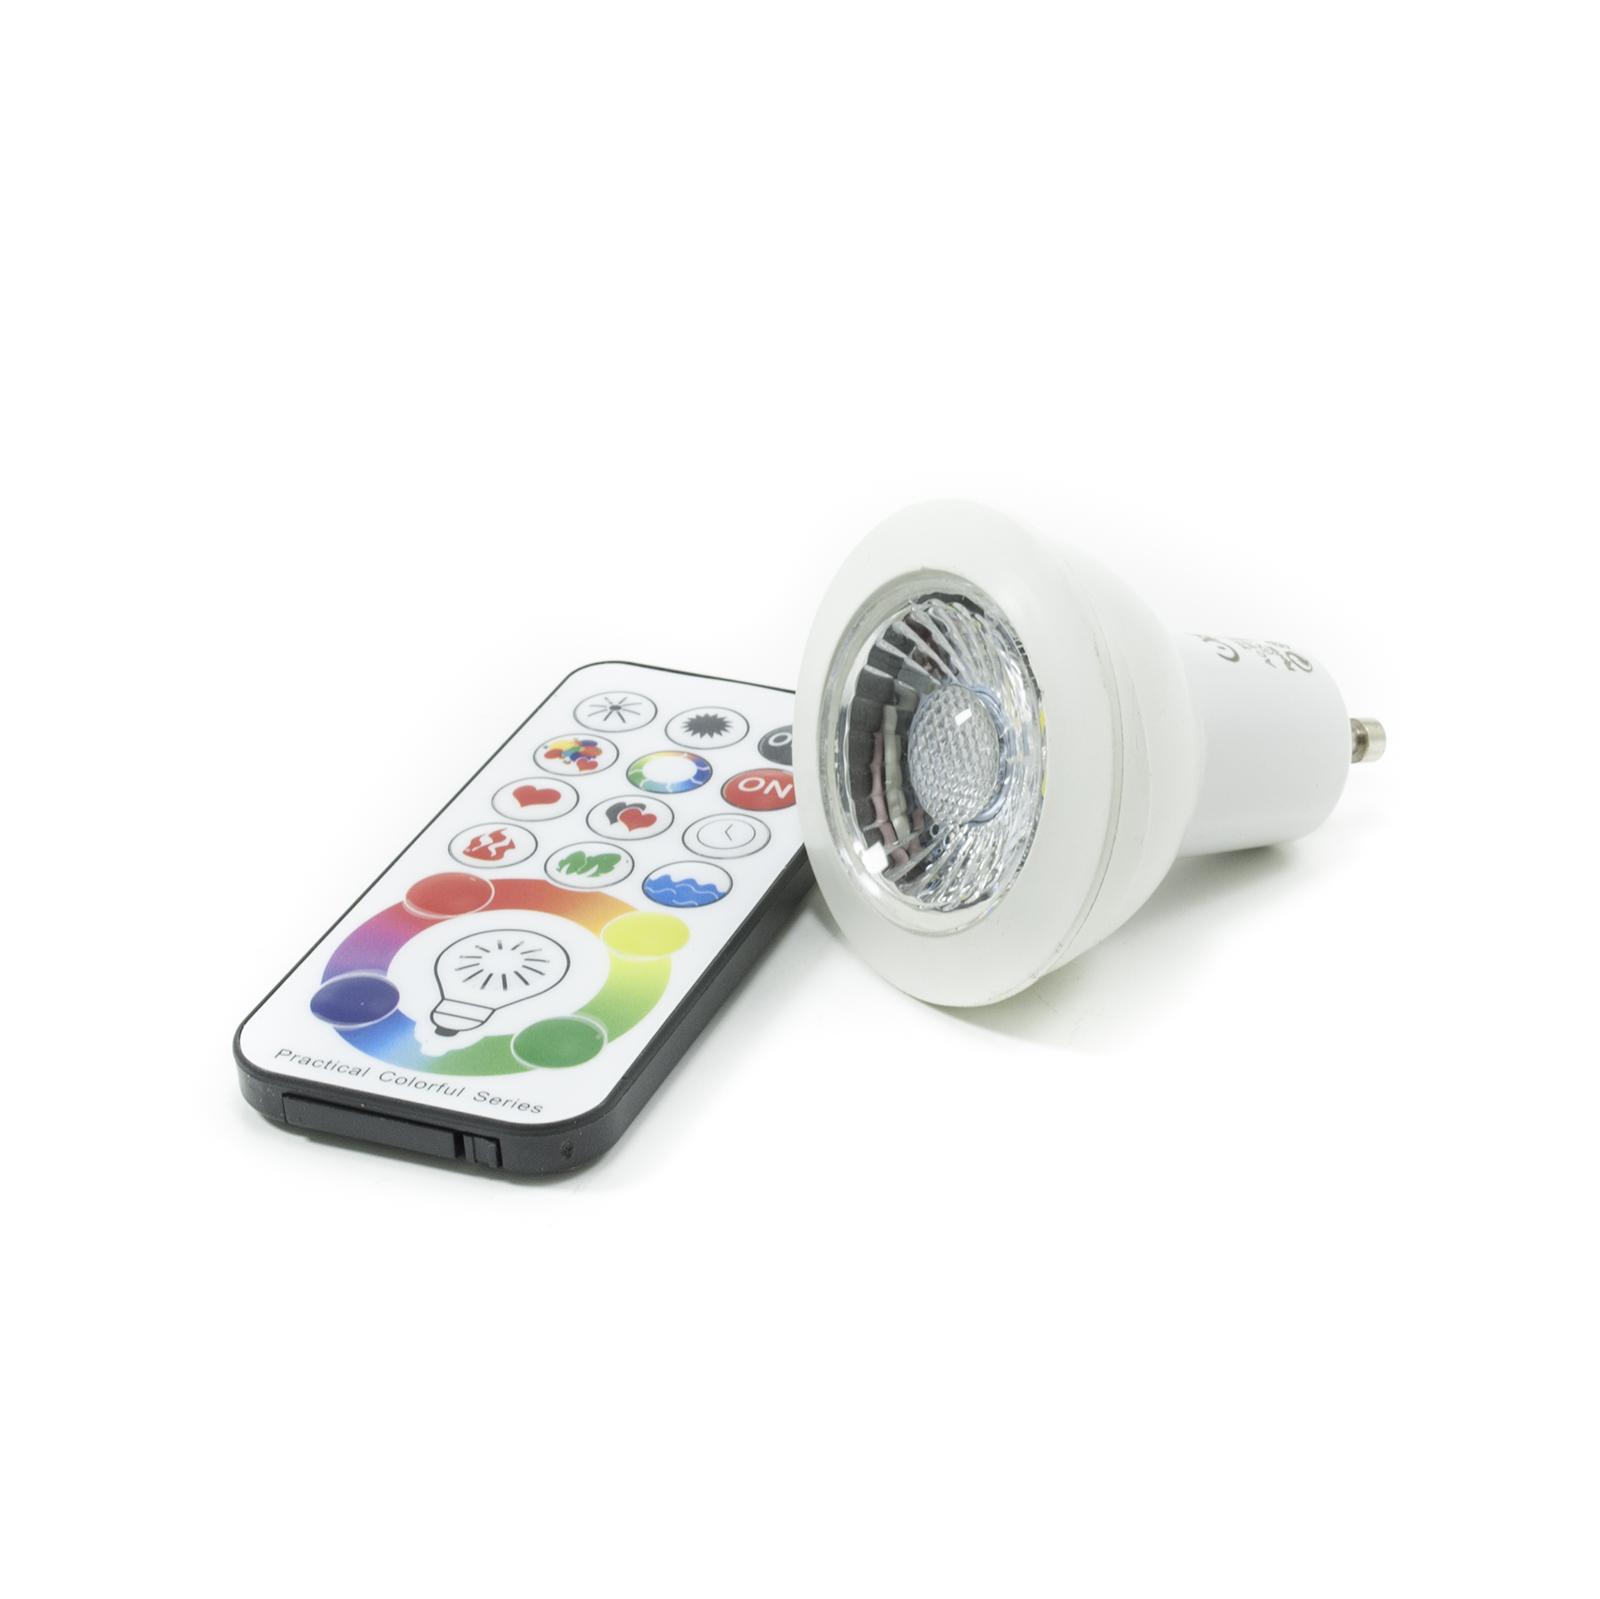 crossled: Led-strahler GU10 RGBW 6w led-lampe farbtherapie ...